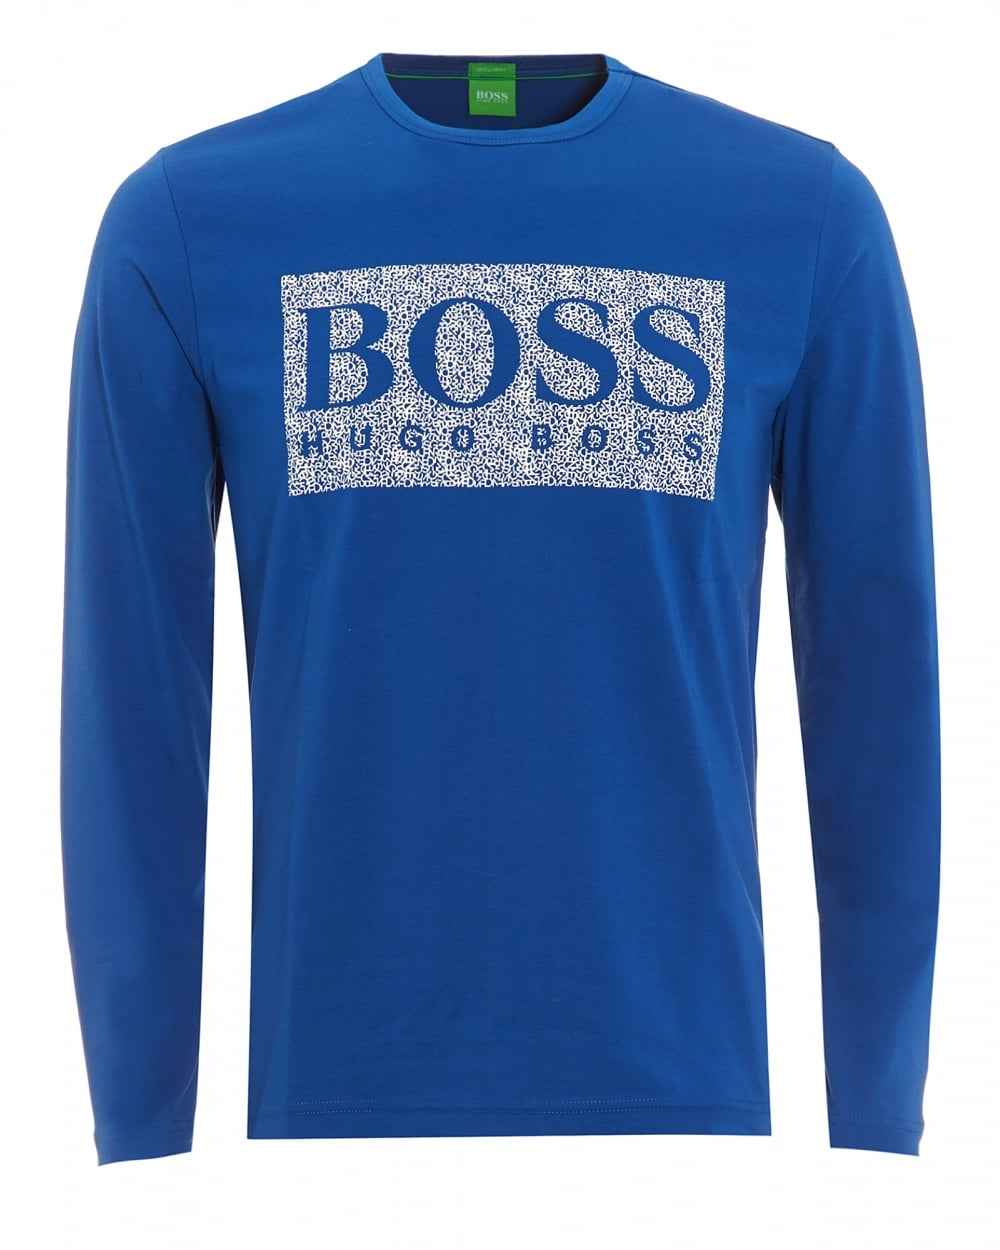 0fa8f13d Hugo Boss Green Mens Togn 1 T-Shirt, Monaco Blue Long Sleeve Logo Tee